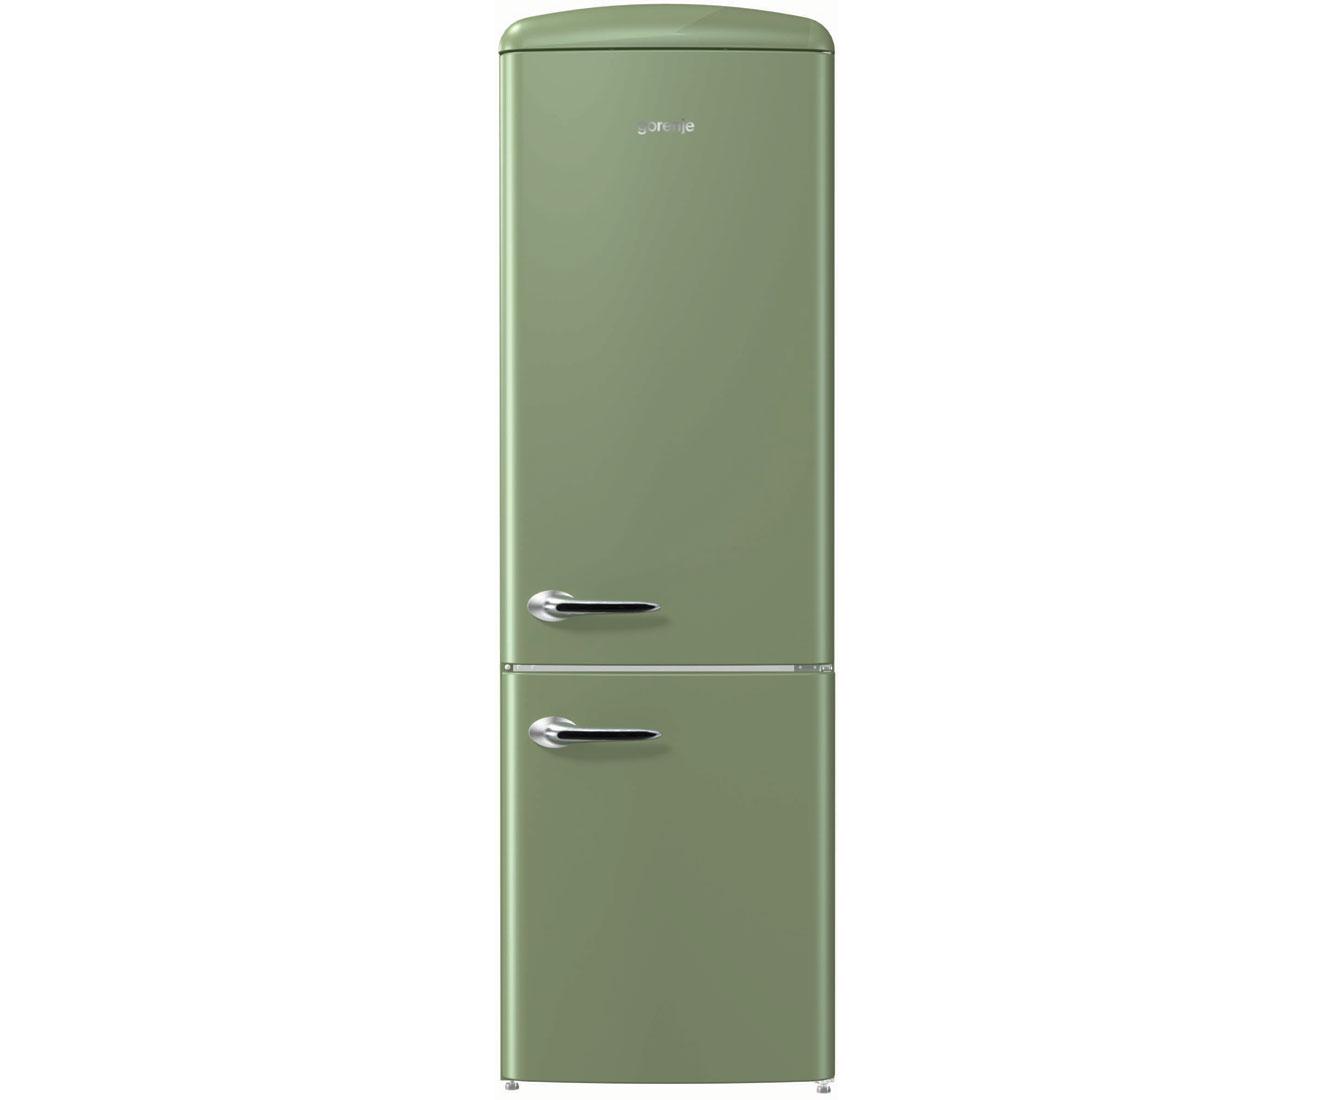 Gorenje Kühlschrank Kombi : Gorenje kühlschrank kombi abtauen: bosch kgv39vl33 edelstahl